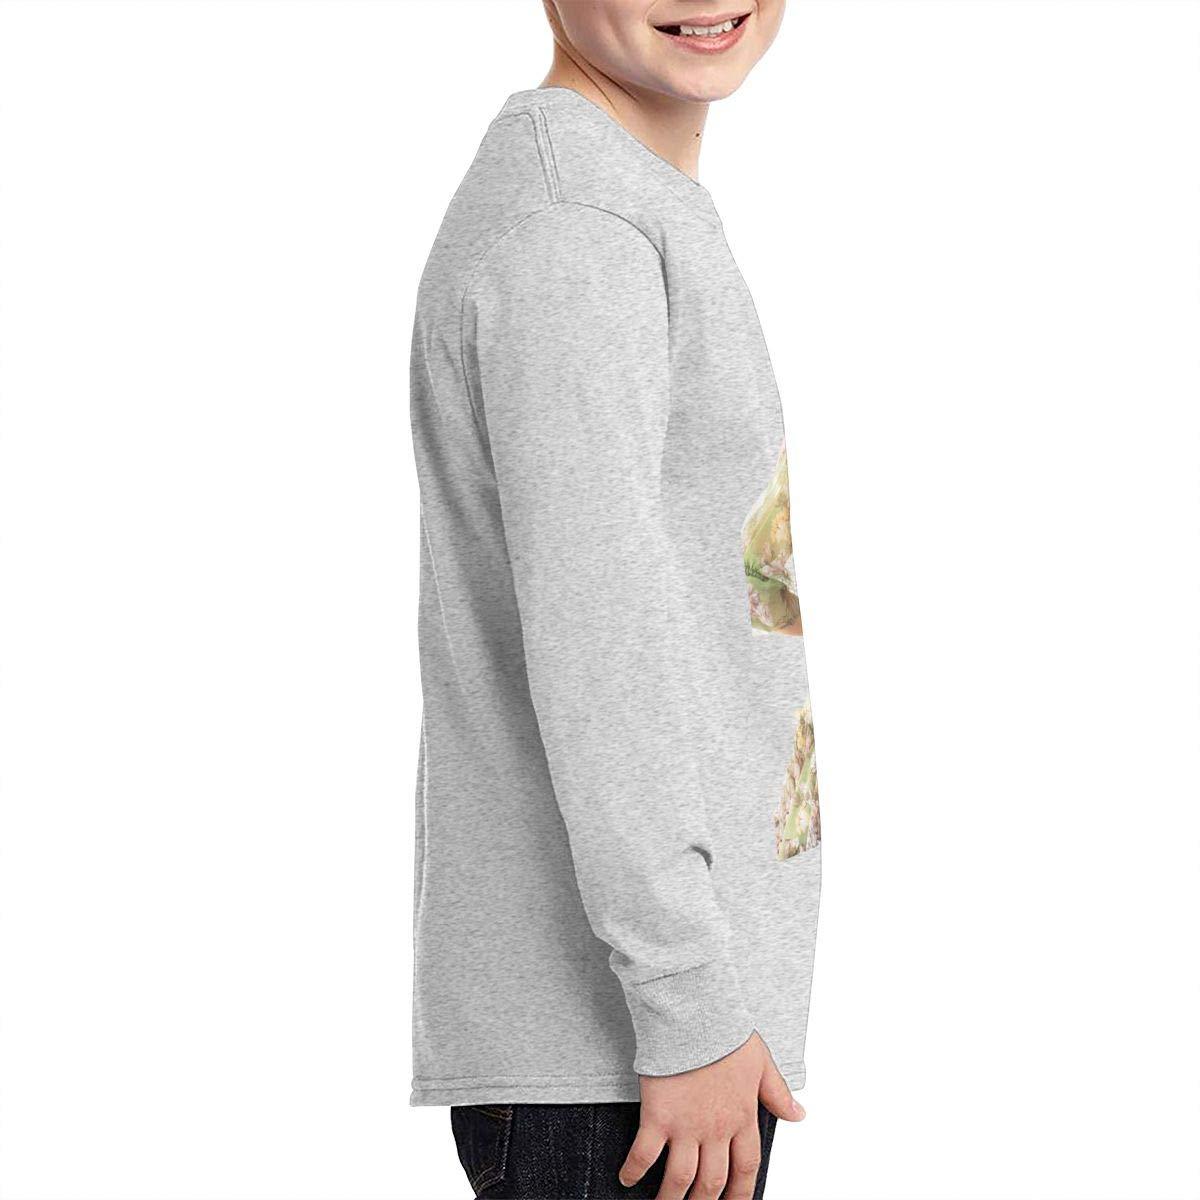 RhteGui Cardi-B Boys /& Girls Junior Vintage Long Sleeve T-Shirt Black